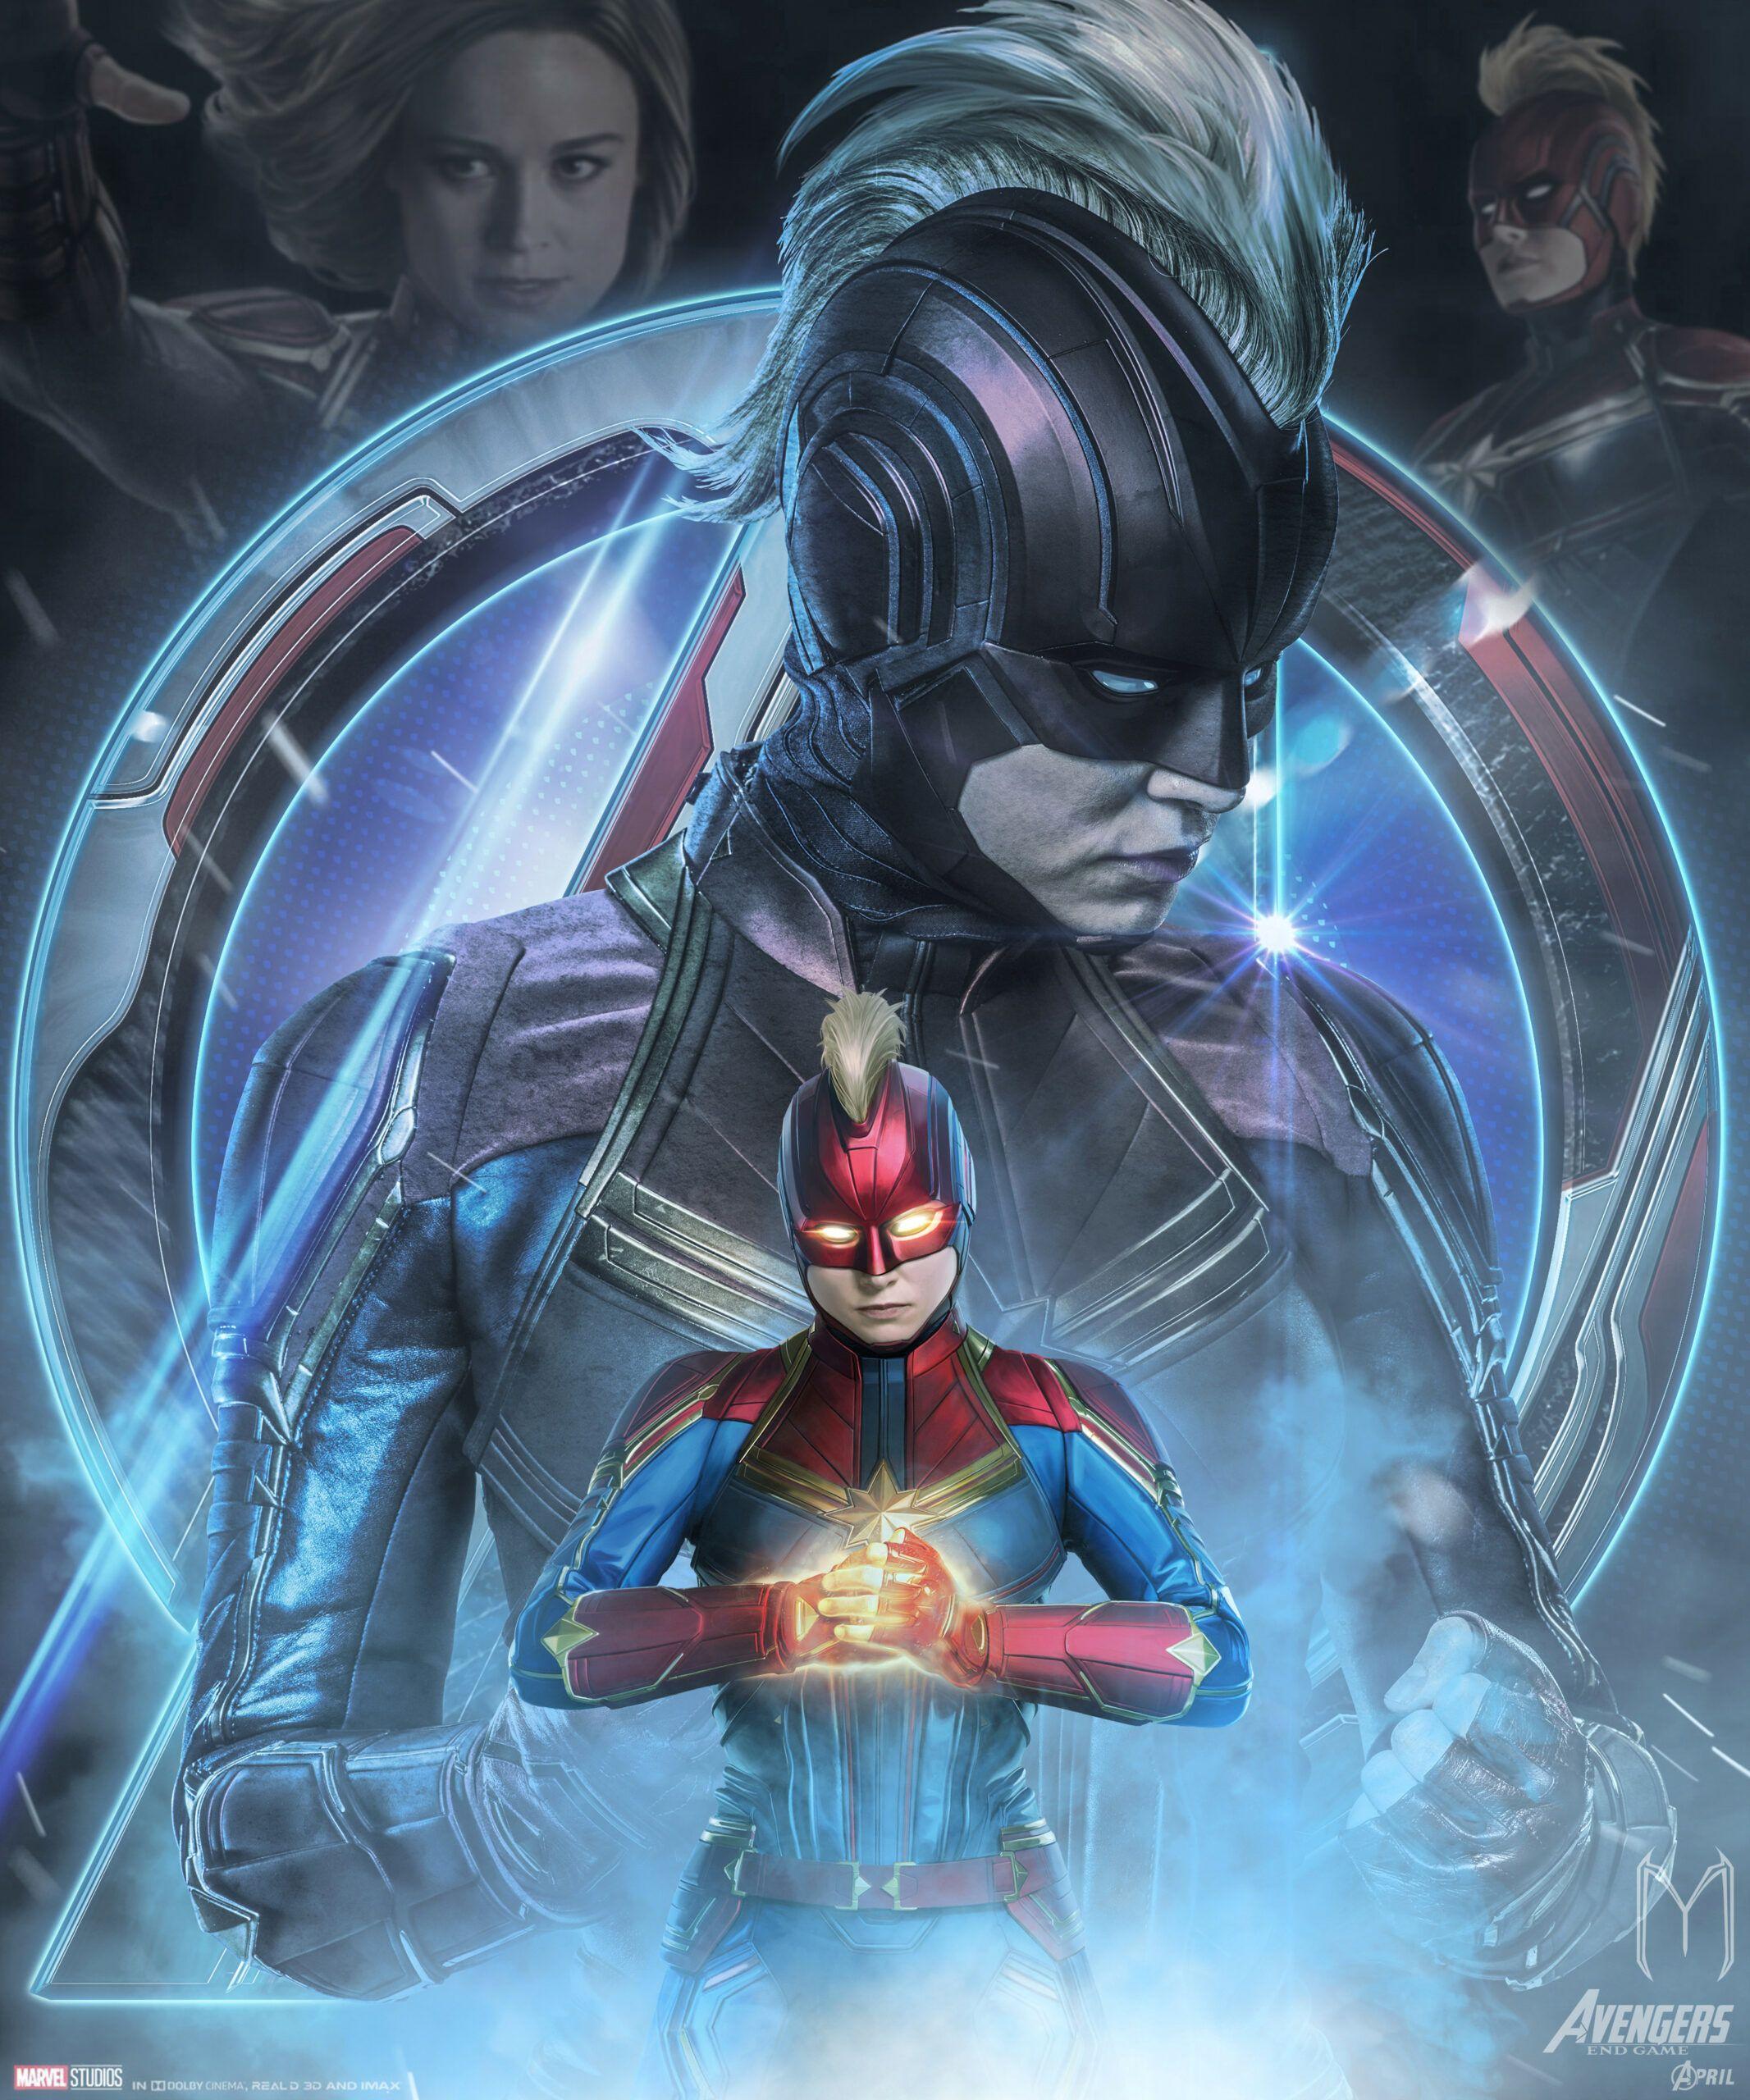 Beautiful Free Avengers Endgame Captain Marvel Poster Art Marvel Posters Marvel Superheroes Marvel